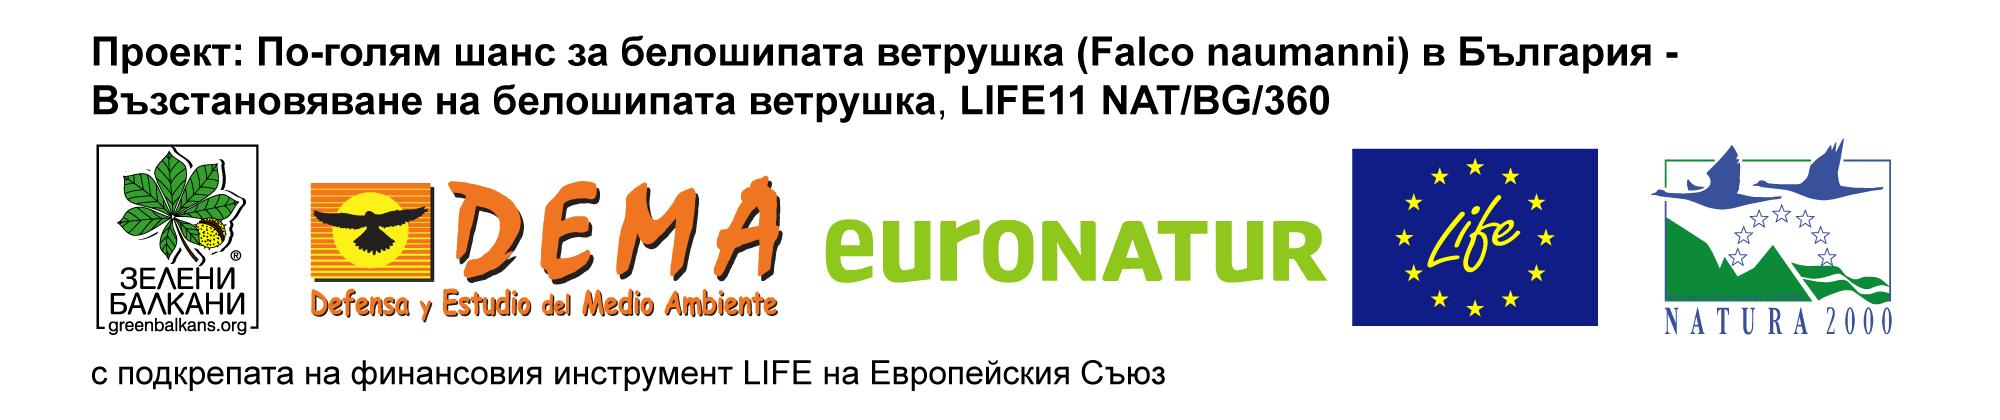 http://www.greenbalkans.org/userfiles/image/logo%20LIFE%20Falco/Blanka_LIFE_Vetrushka_bg(1).jpg